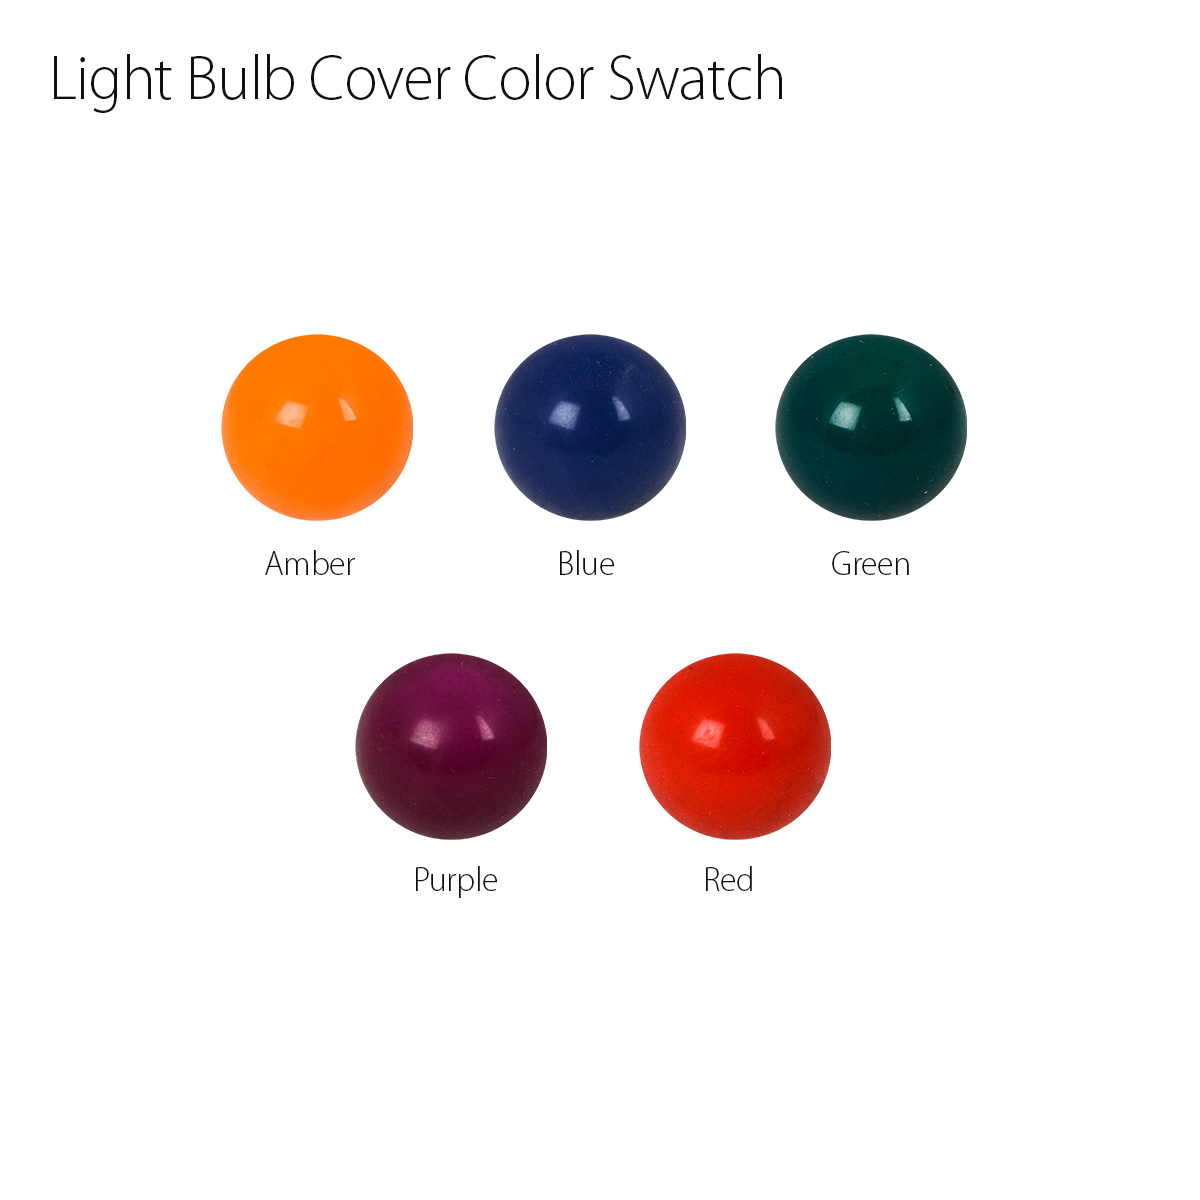 Medium Bulb Cover Color Swatch